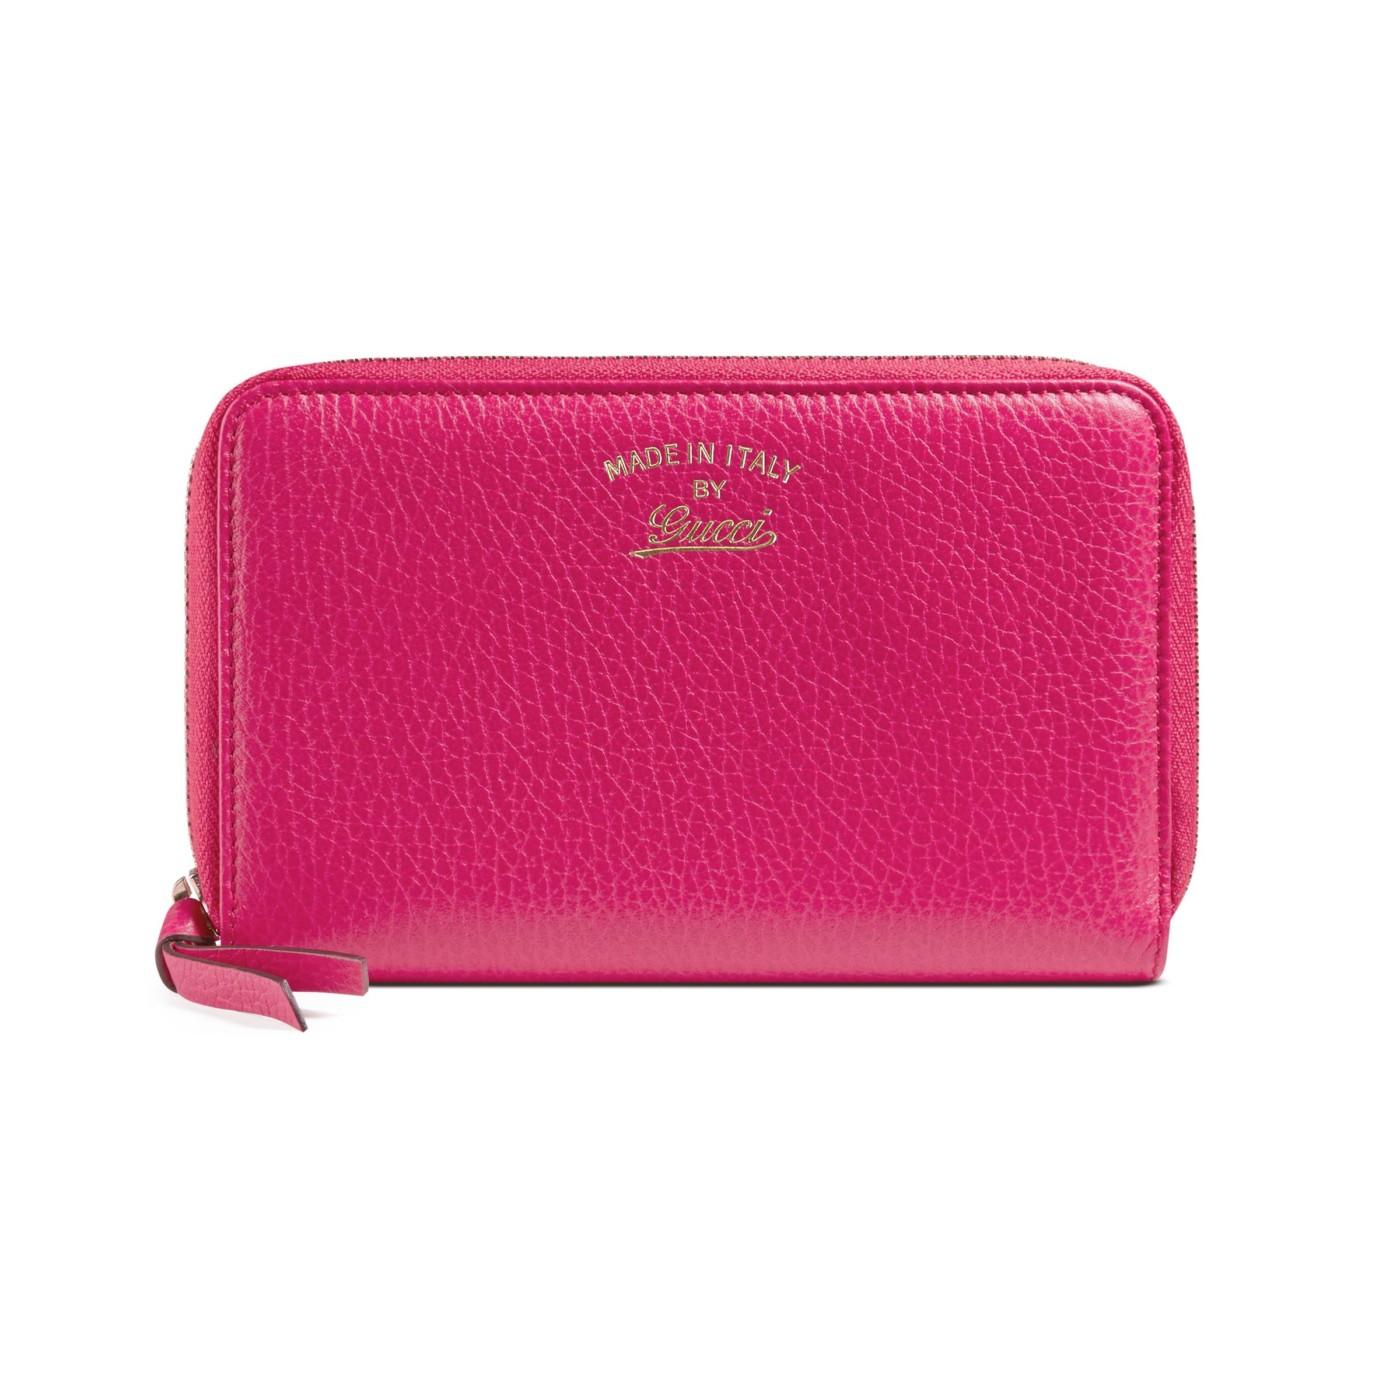 71df5bd78bc Gucci Women s Fuchsia Leather Swing Zip Around Wallet